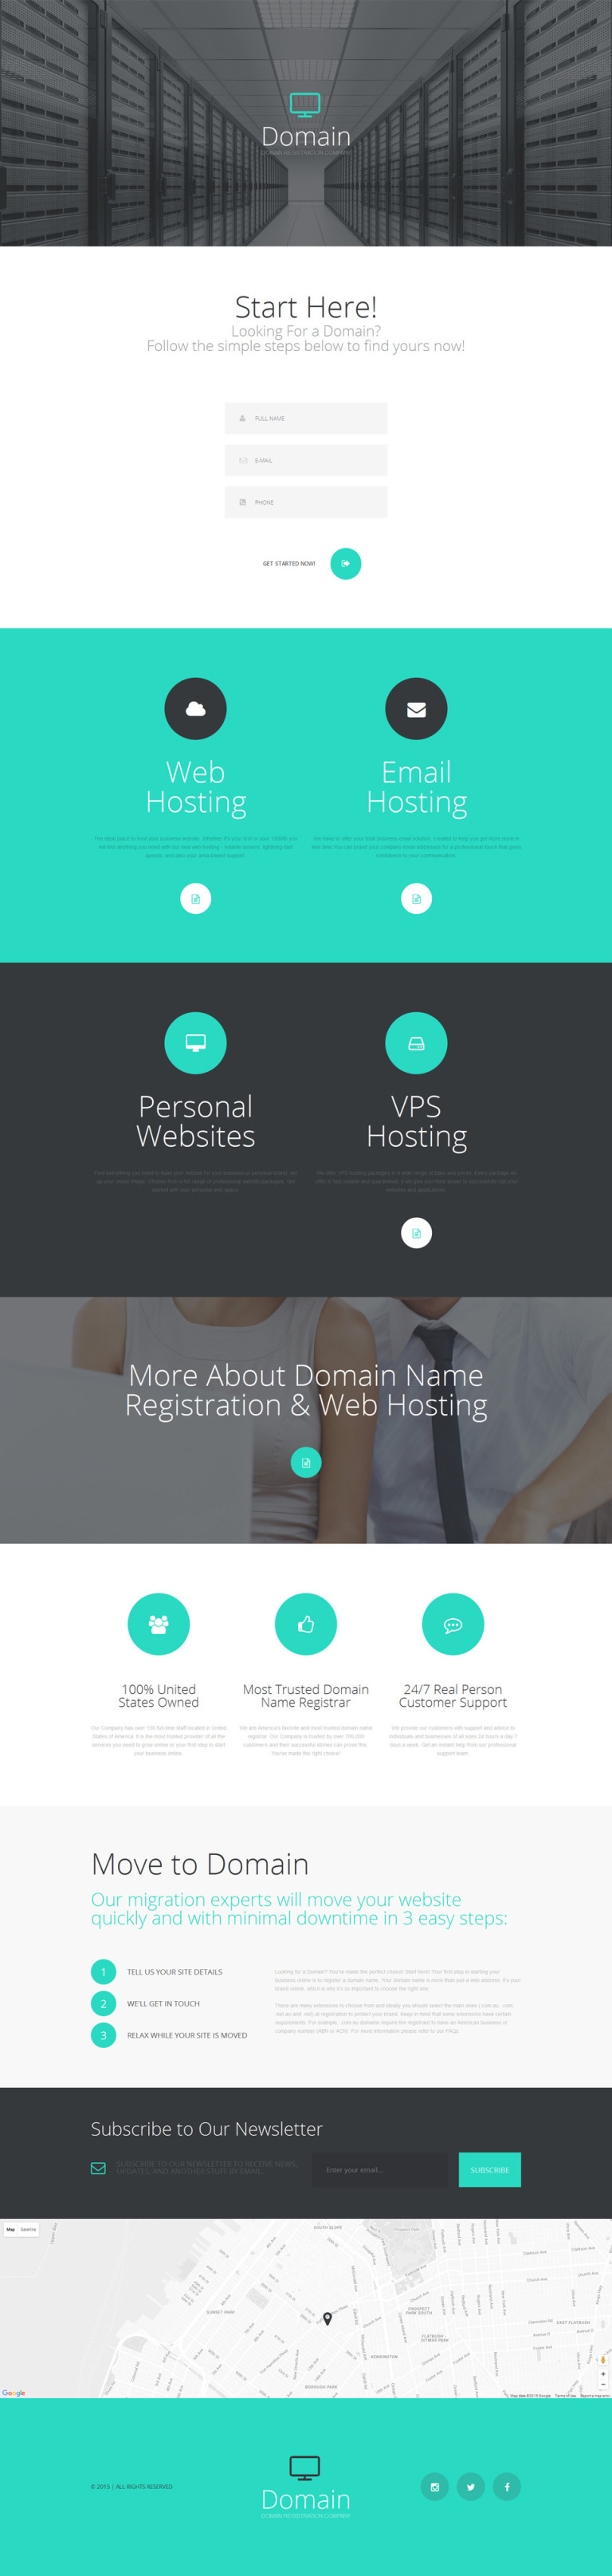 Domain Registrar Responsive Landing Page Template New Screenshots BIG